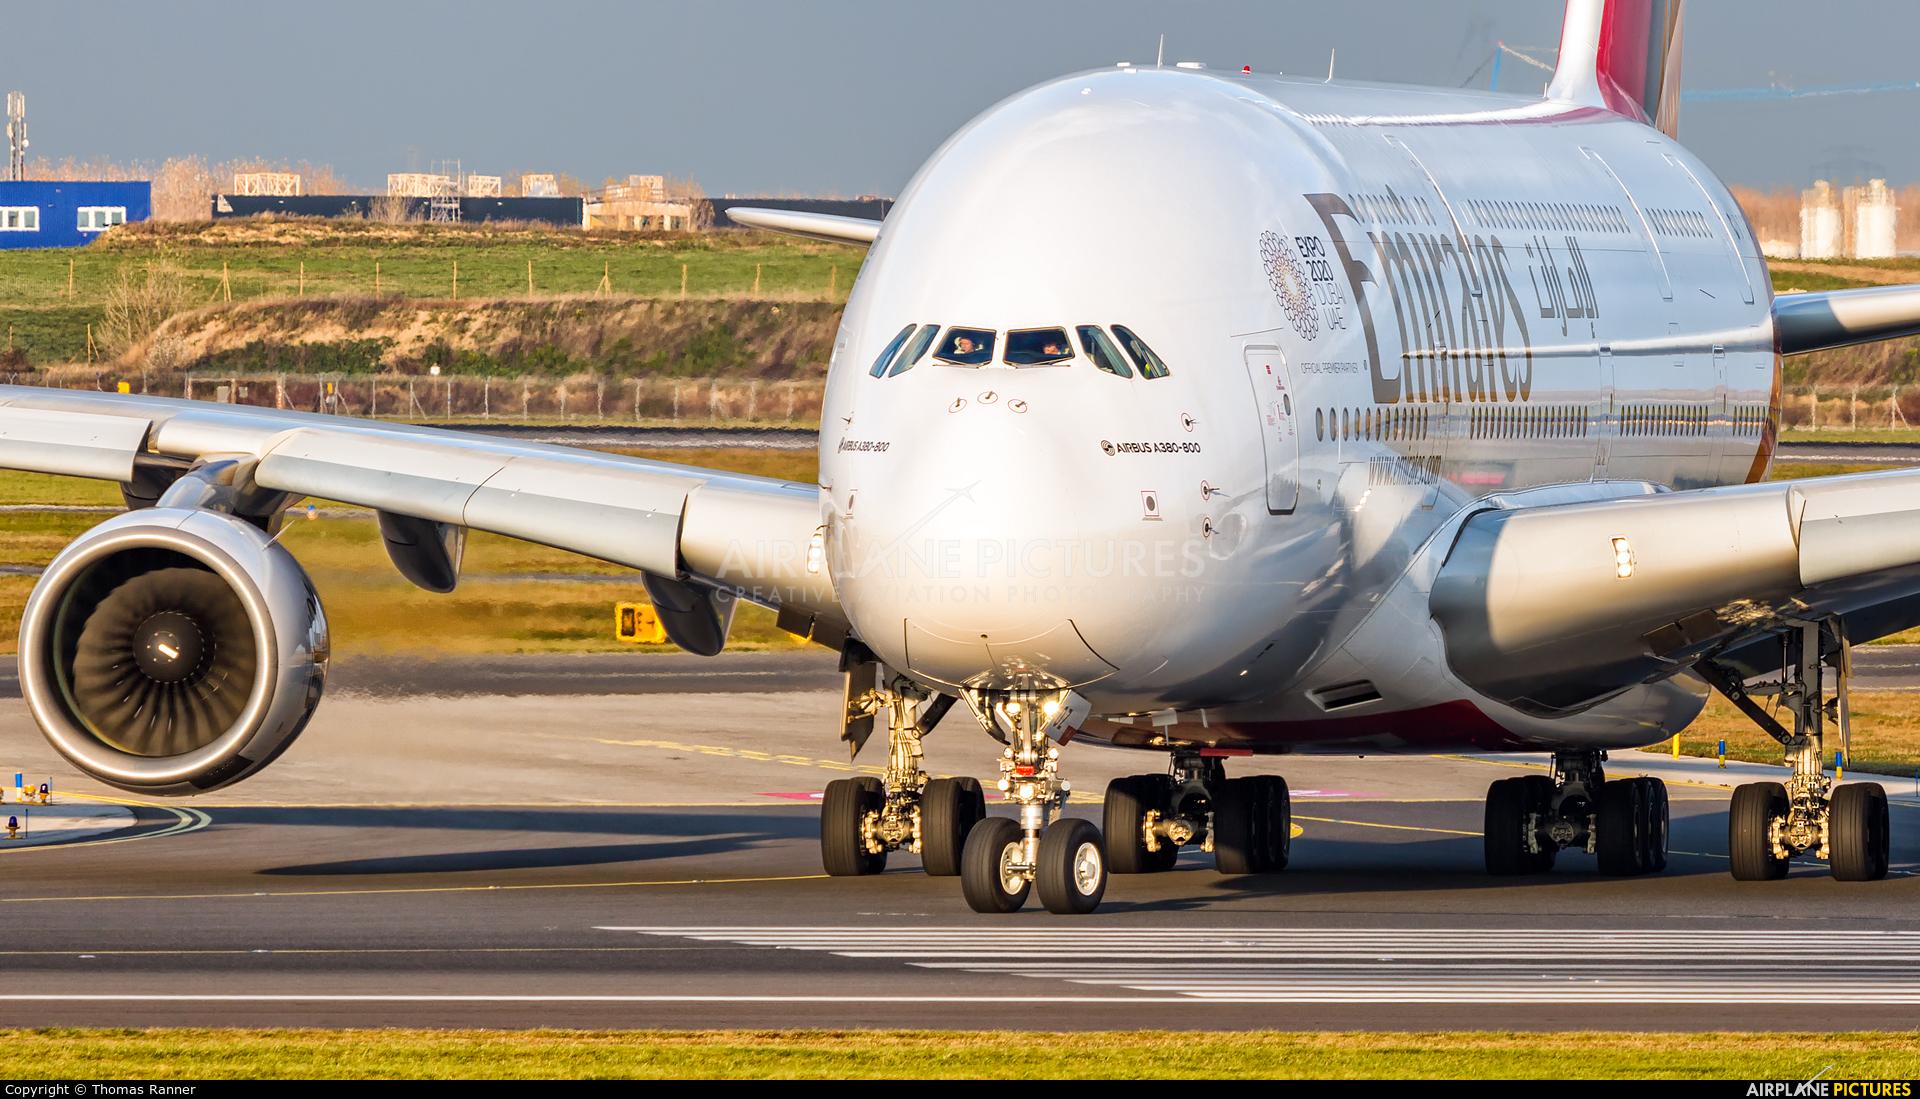 Emirates Airlines A6-EOZ aircraft at Vienna - Schwechat